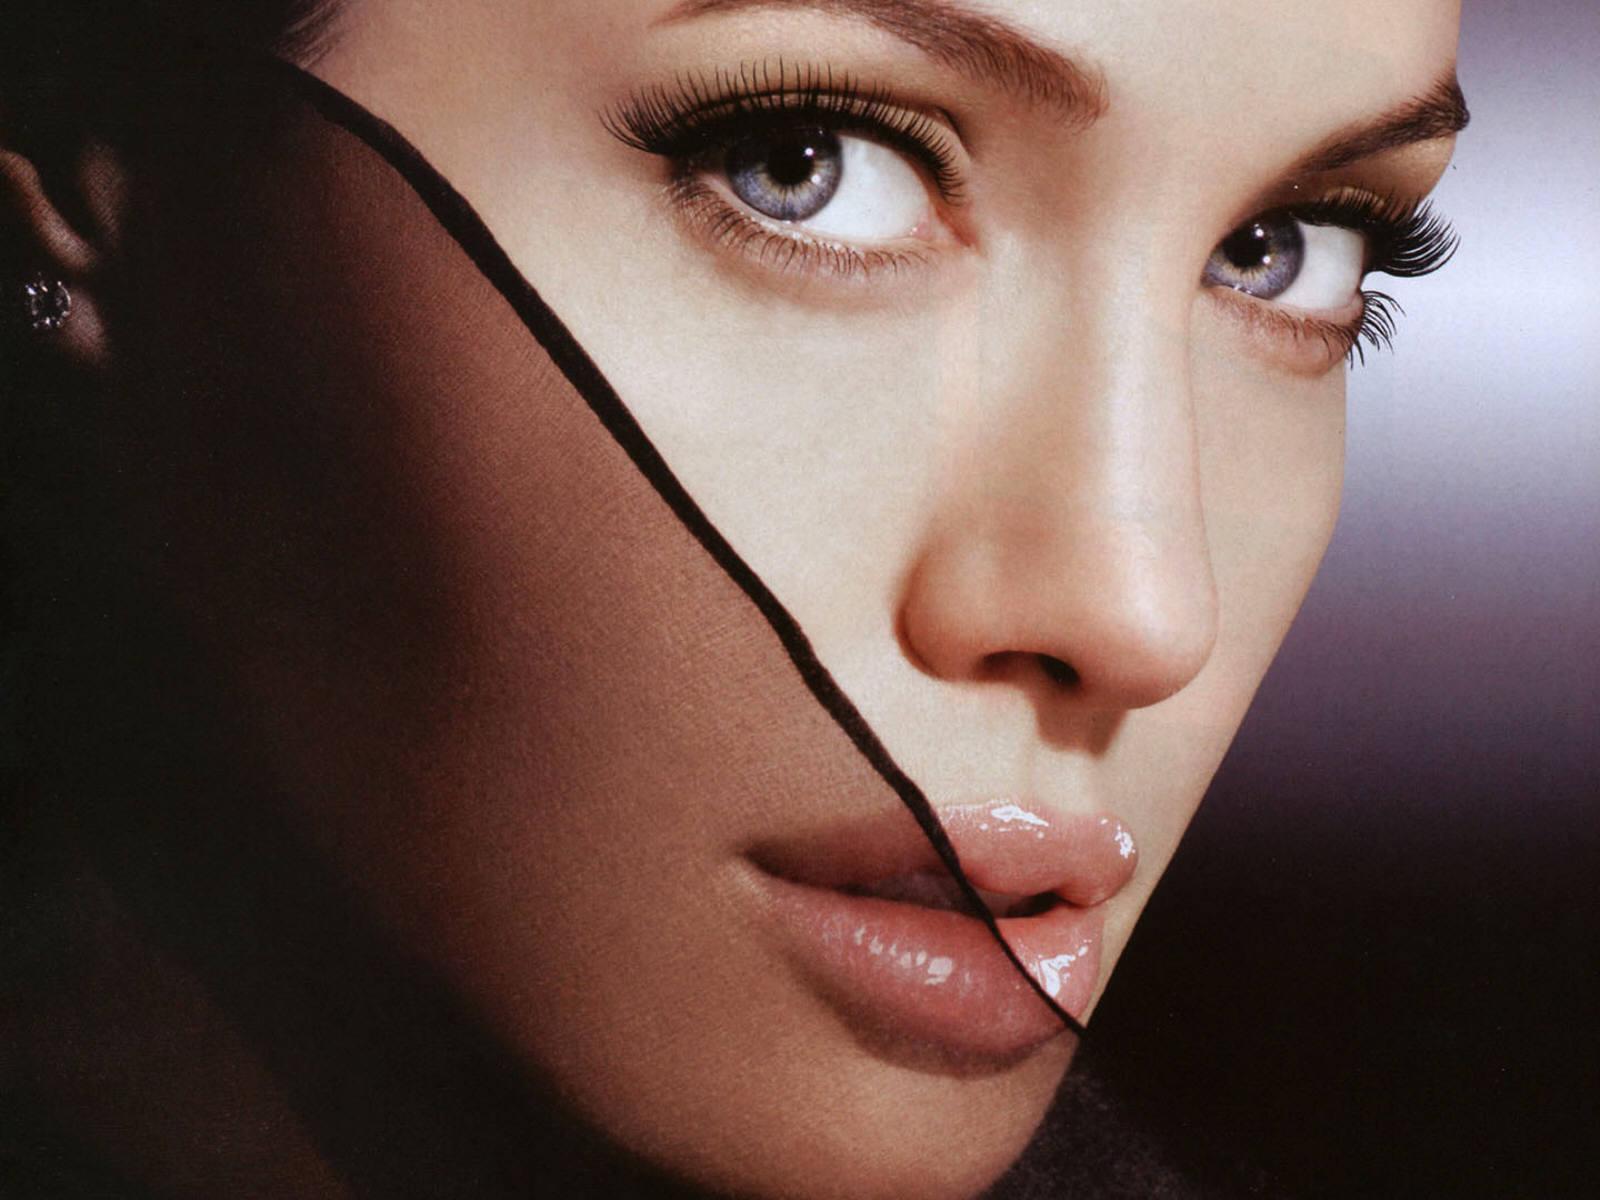 http://1.bp.blogspot.com/_p2EstT5Z5BU/THtqOBzv2ZI/AAAAAAAAAsI/WVZfuy-WObU/s1600/Angelina+Jolie+Wallpapers+1.jpg